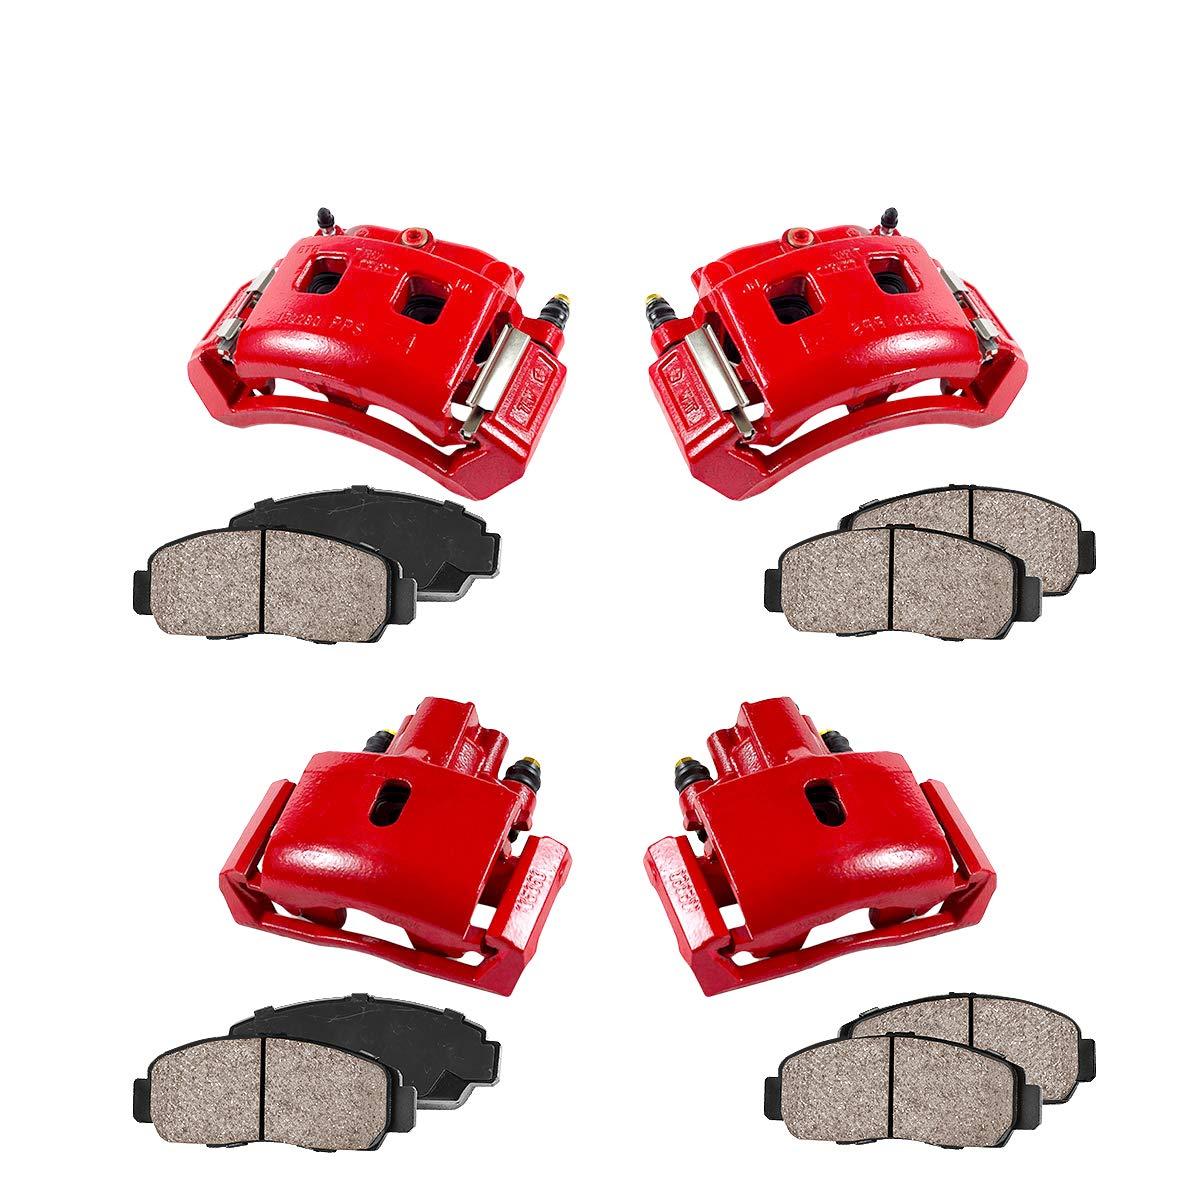 REAR 4 FRONT Ceramic Brake Pads Kit Performance Grade Semi-Loaded Powder Coated Red Caliper